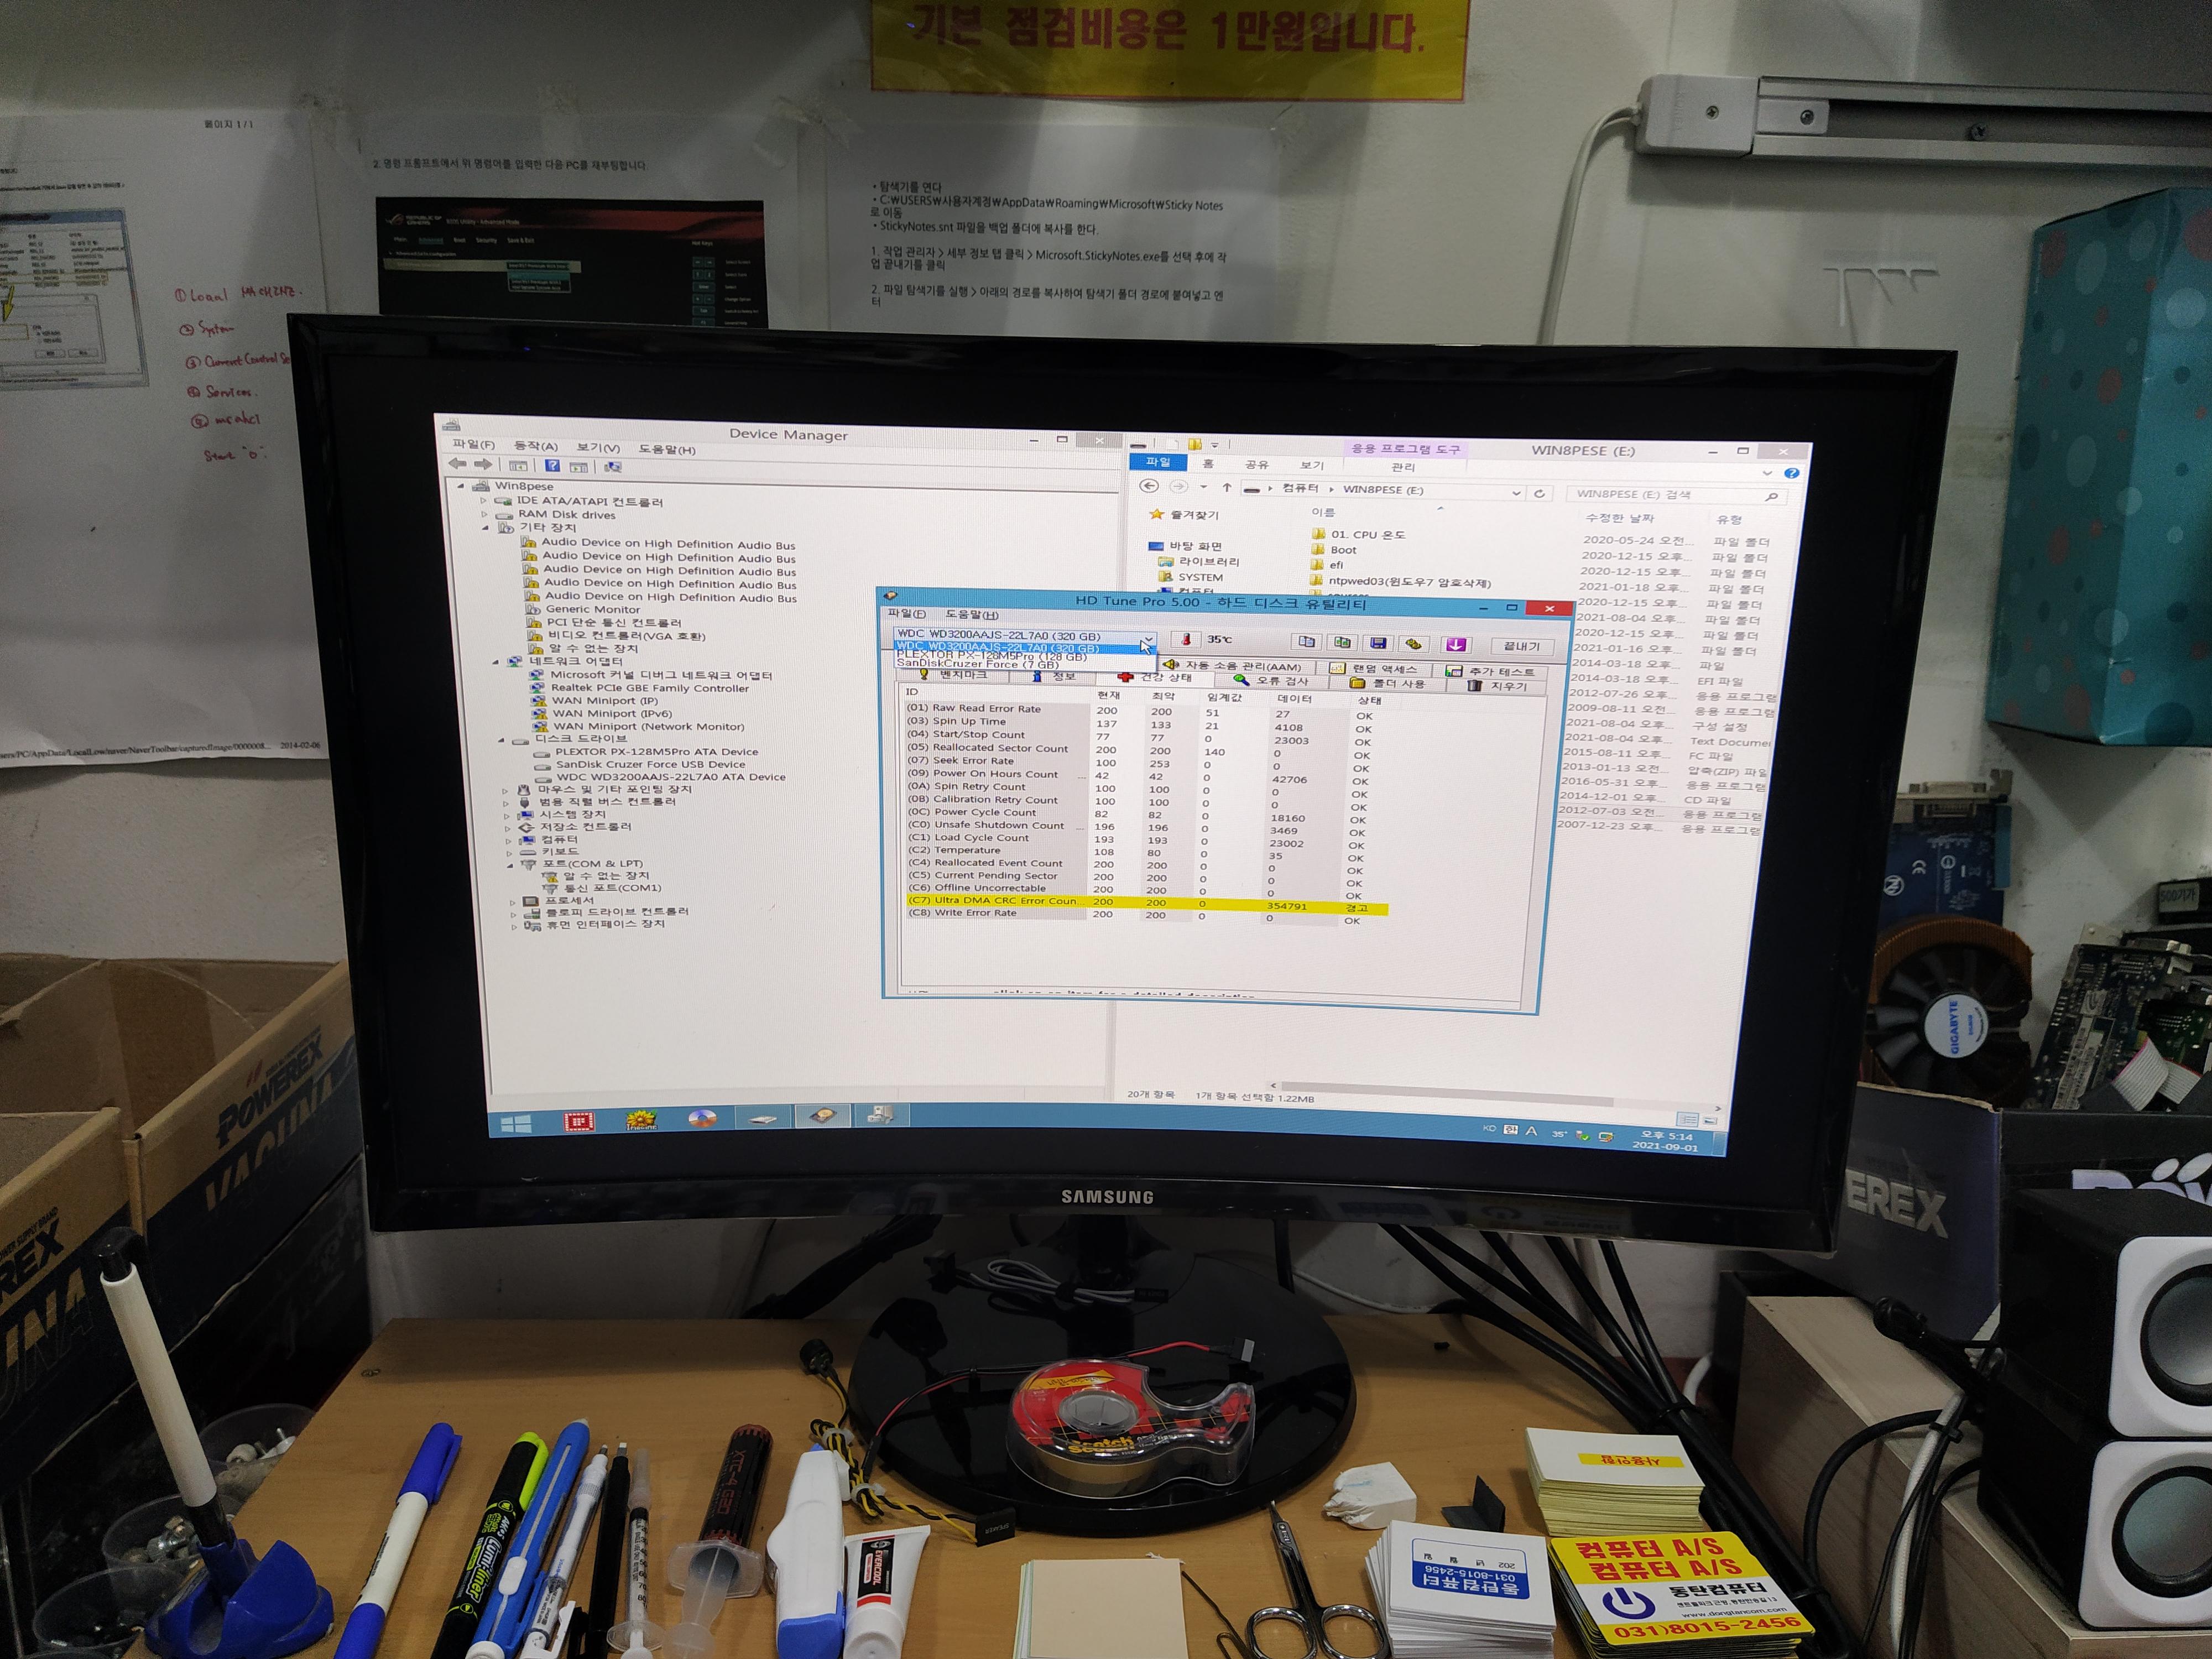 WD3200AAJS-22L7A0 (320기가 웨스턴디지털 하드디스크)와 PLEXTOR PX-128M5Pro SSD가 보이네요.